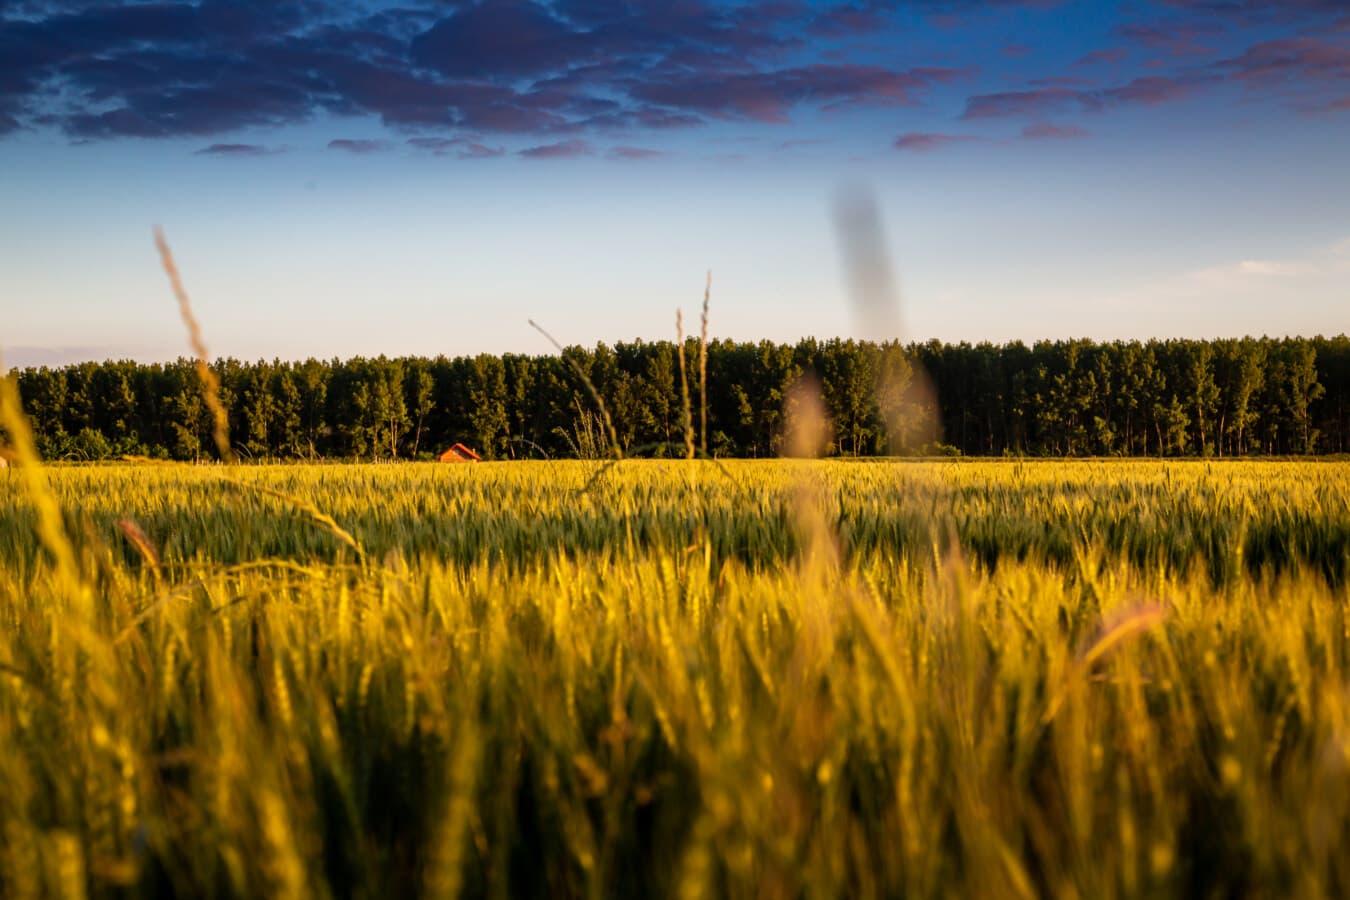 agriculture, field, wheatfield, dawn, clouds, dramatic, blue sky, landscape, farm, rural